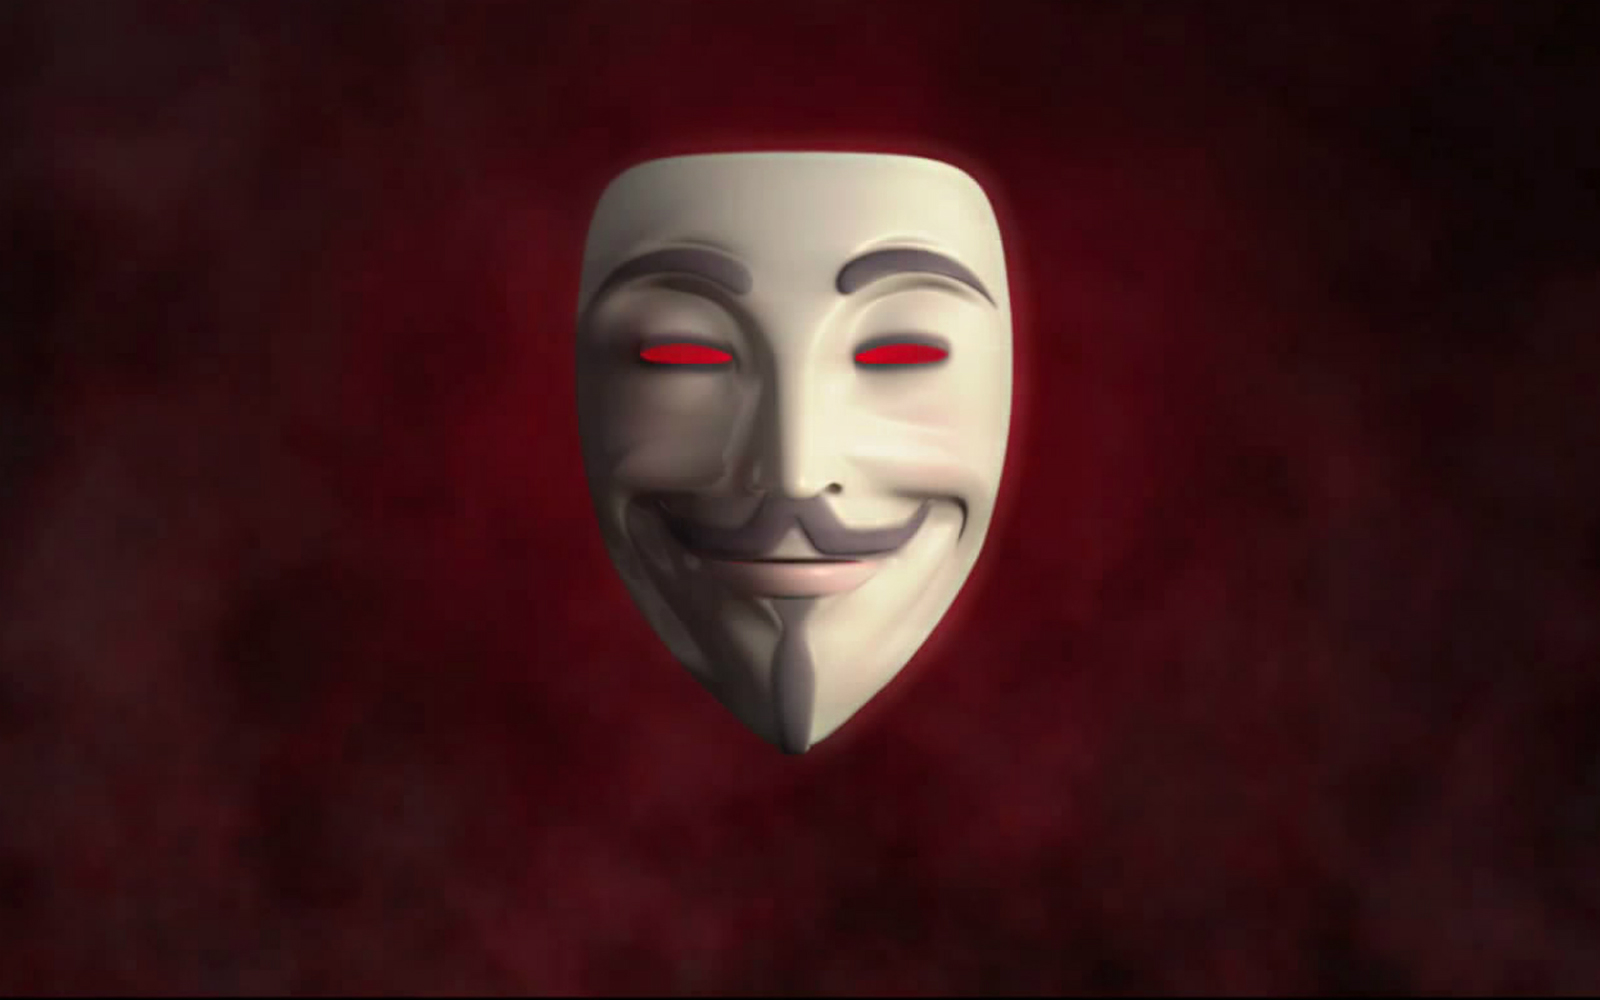 V For Vendetta Mask Wallpaper Army Guy Fawkes Mask...